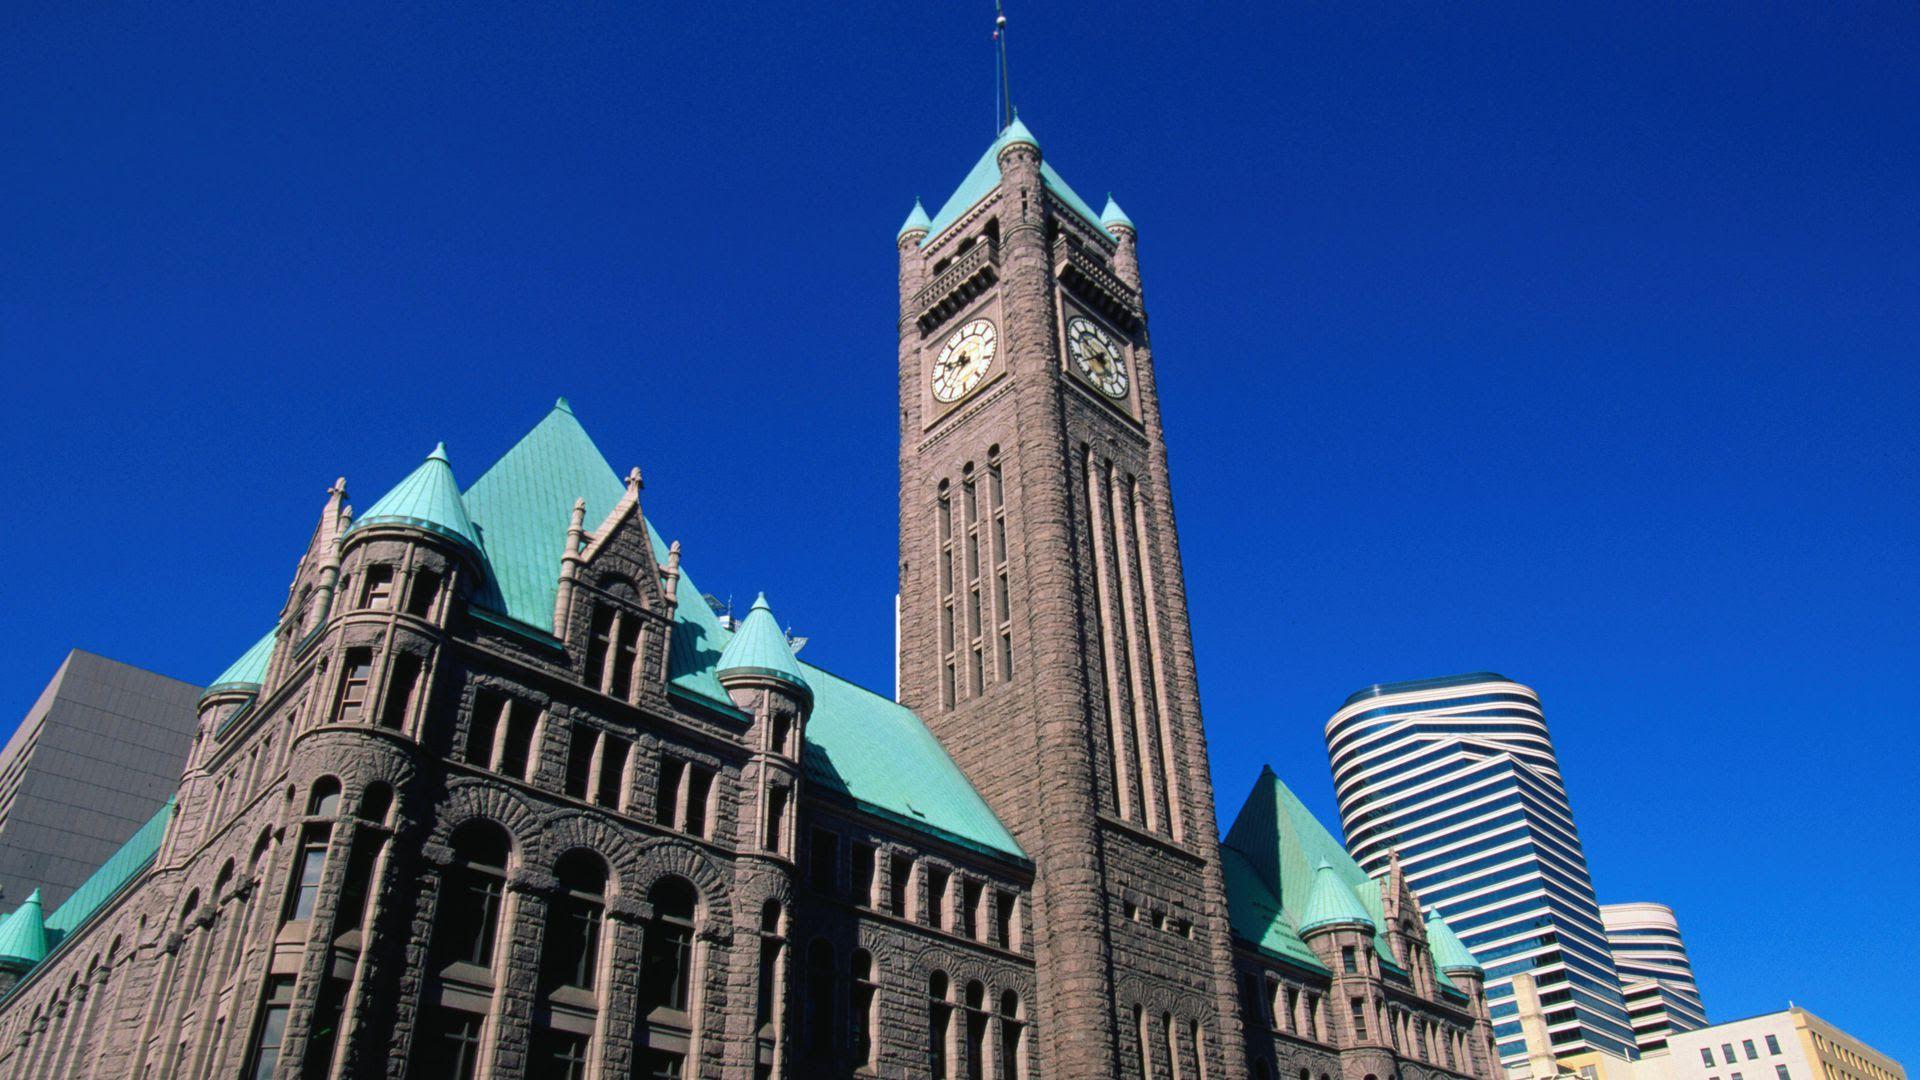 The exterior of Minneapolis City Hall.